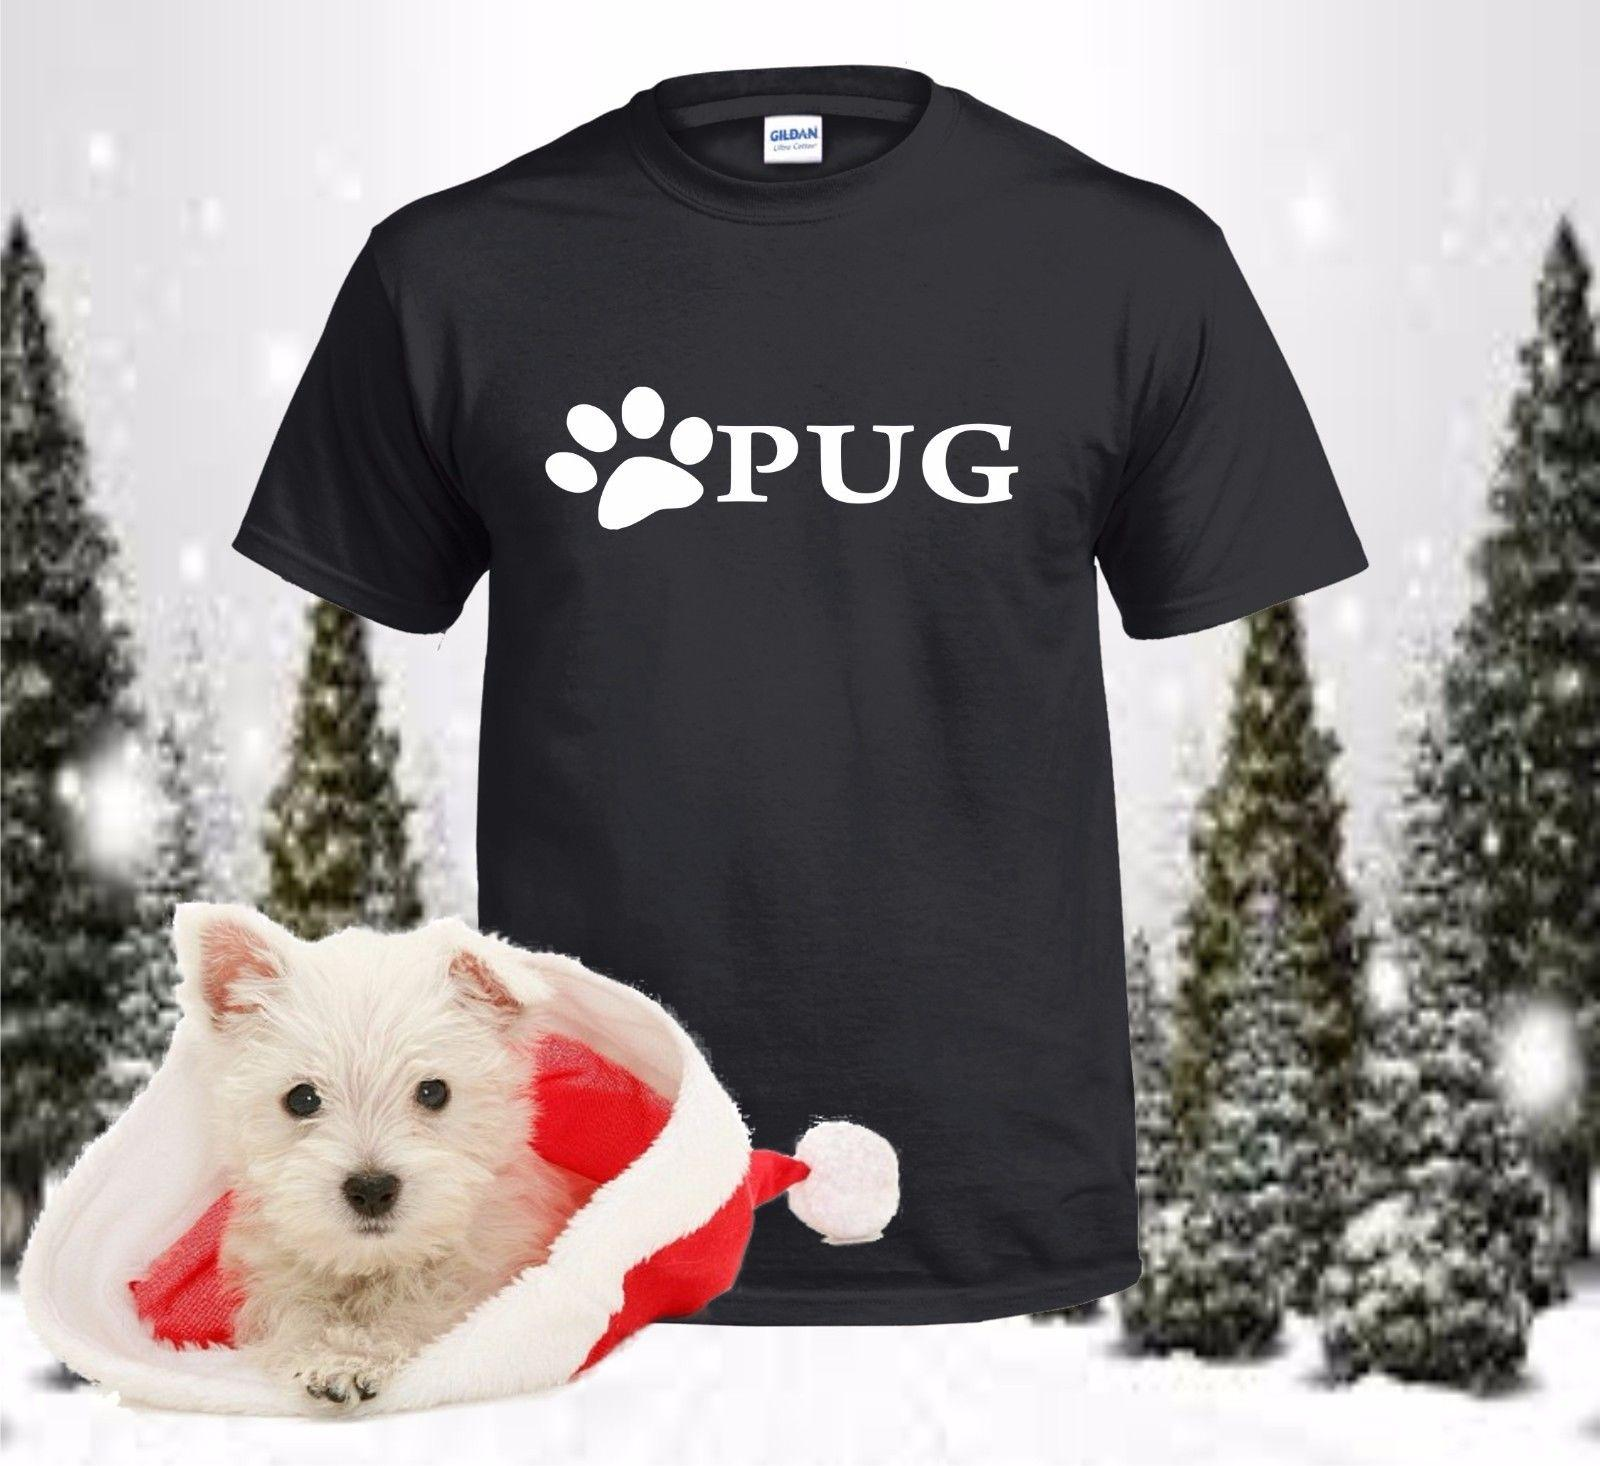 2f85b267d Pug, Pug Mom, Pug Dad, Pug Paw, Pet Lover, Rescue Dog, Dog Paw, Dog, Gifts,  14 NEW Fashion Custom Printed Summer Straight Cotton Funny Vintage T Shirts  T ...